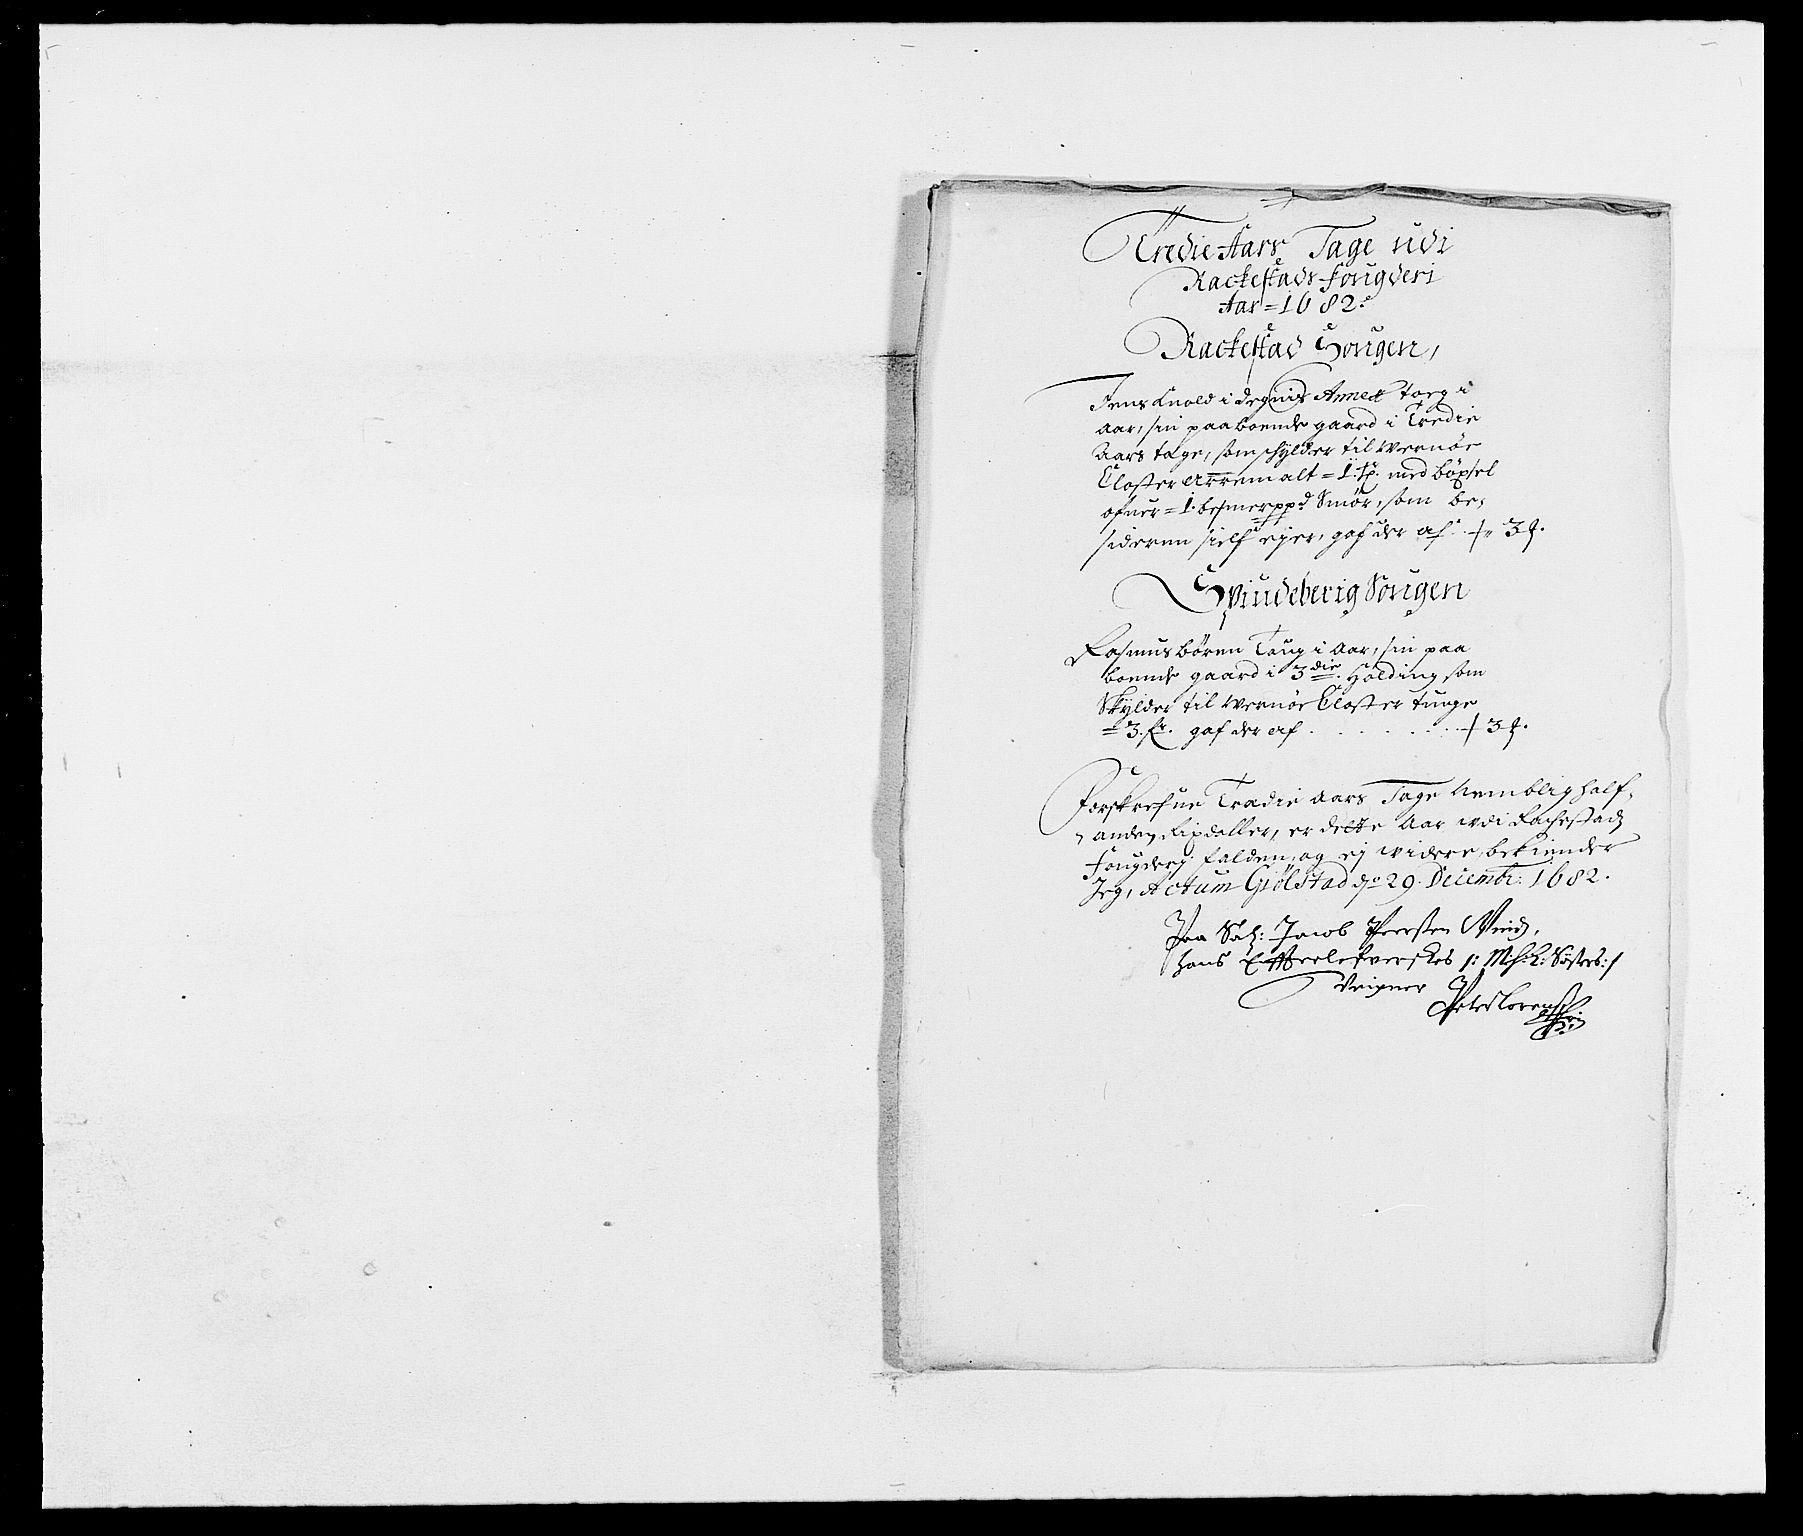 RA, Rentekammeret inntil 1814, Reviderte regnskaper, Fogderegnskap, R05/L0273: Fogderegnskap Rakkestad, 1682, s. 95